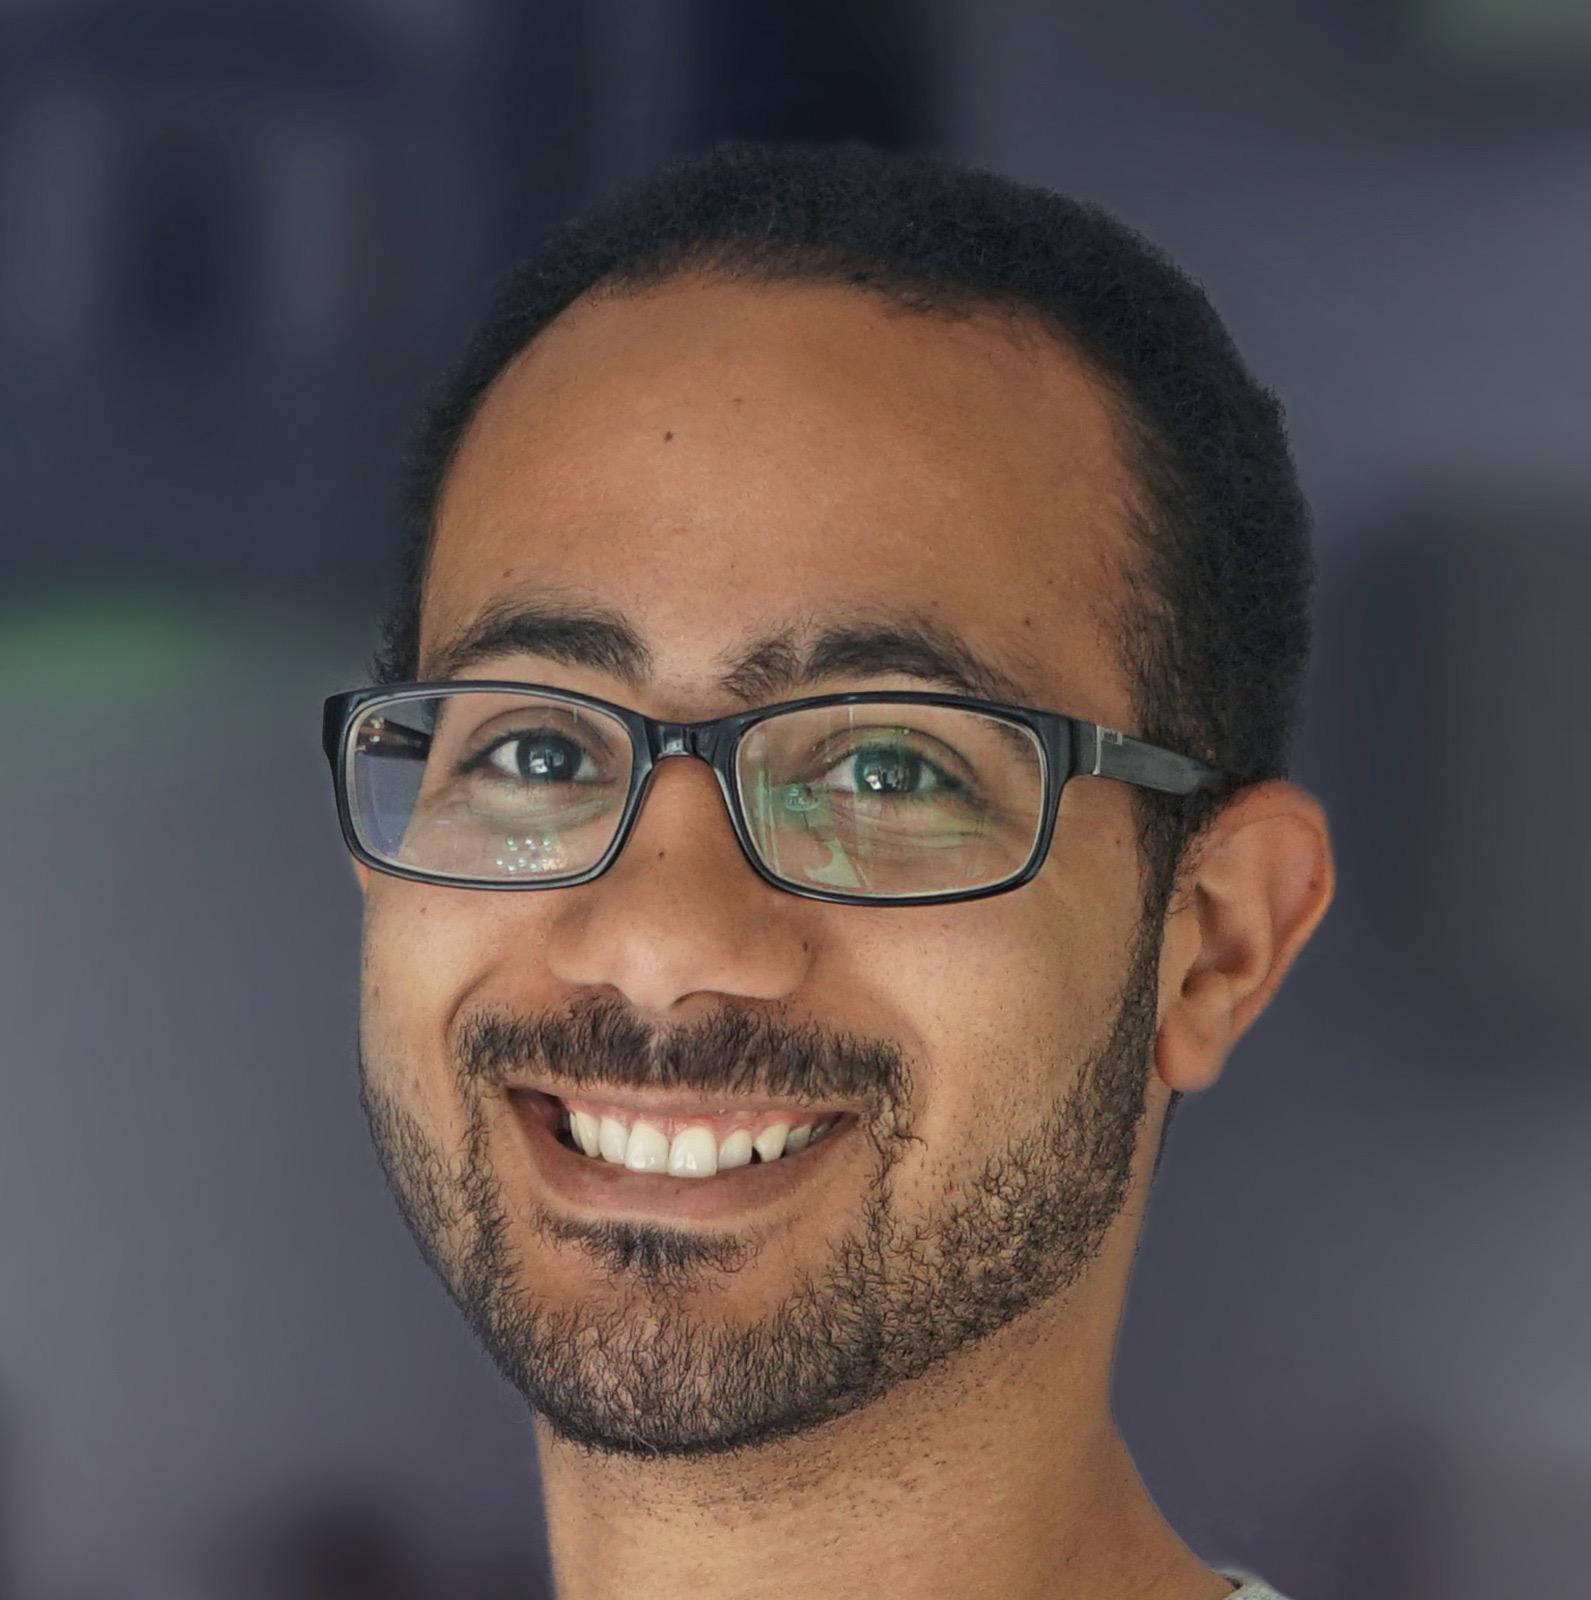 Naji El-Arifi